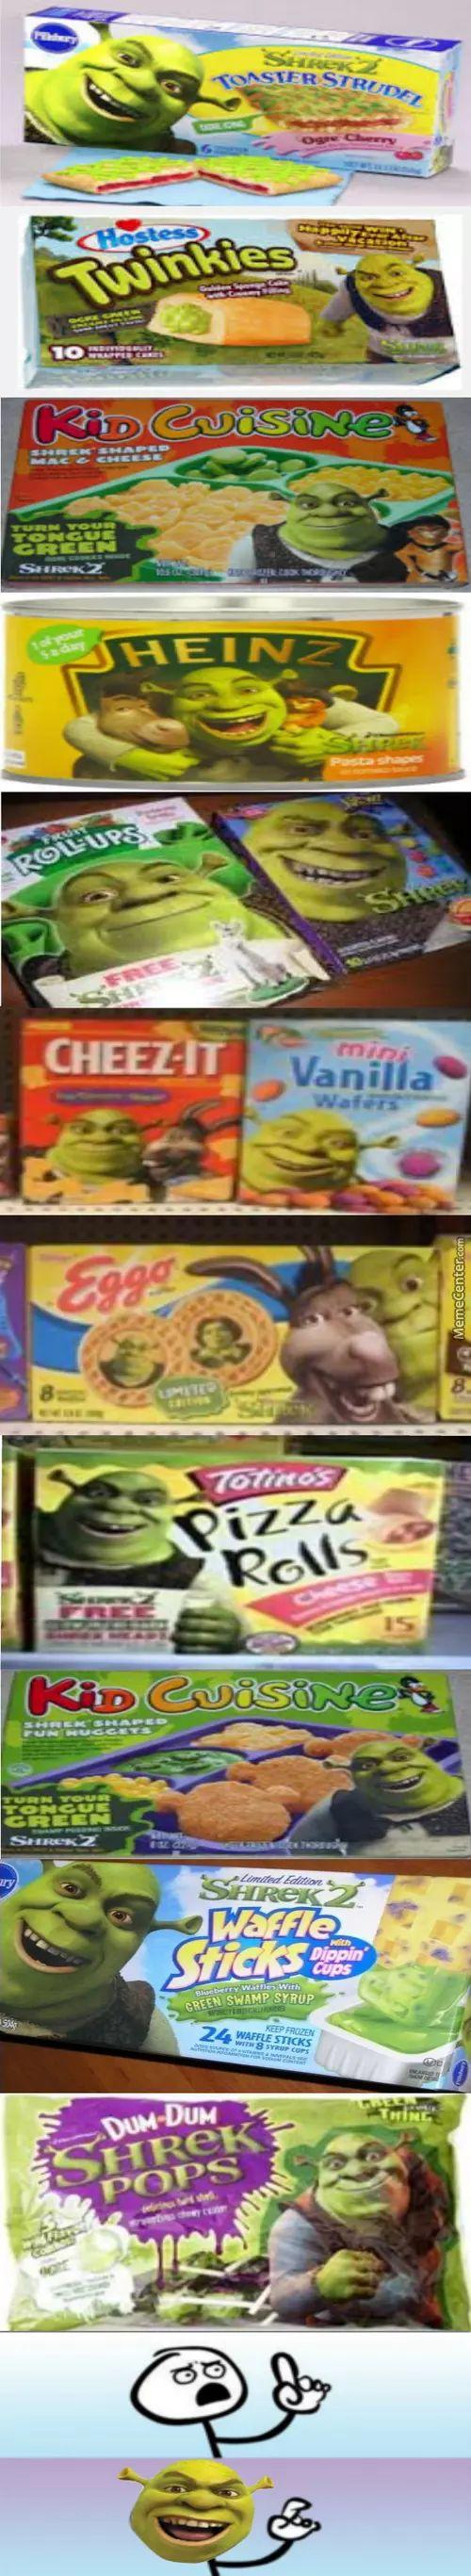 Eat Your Shrek Foods